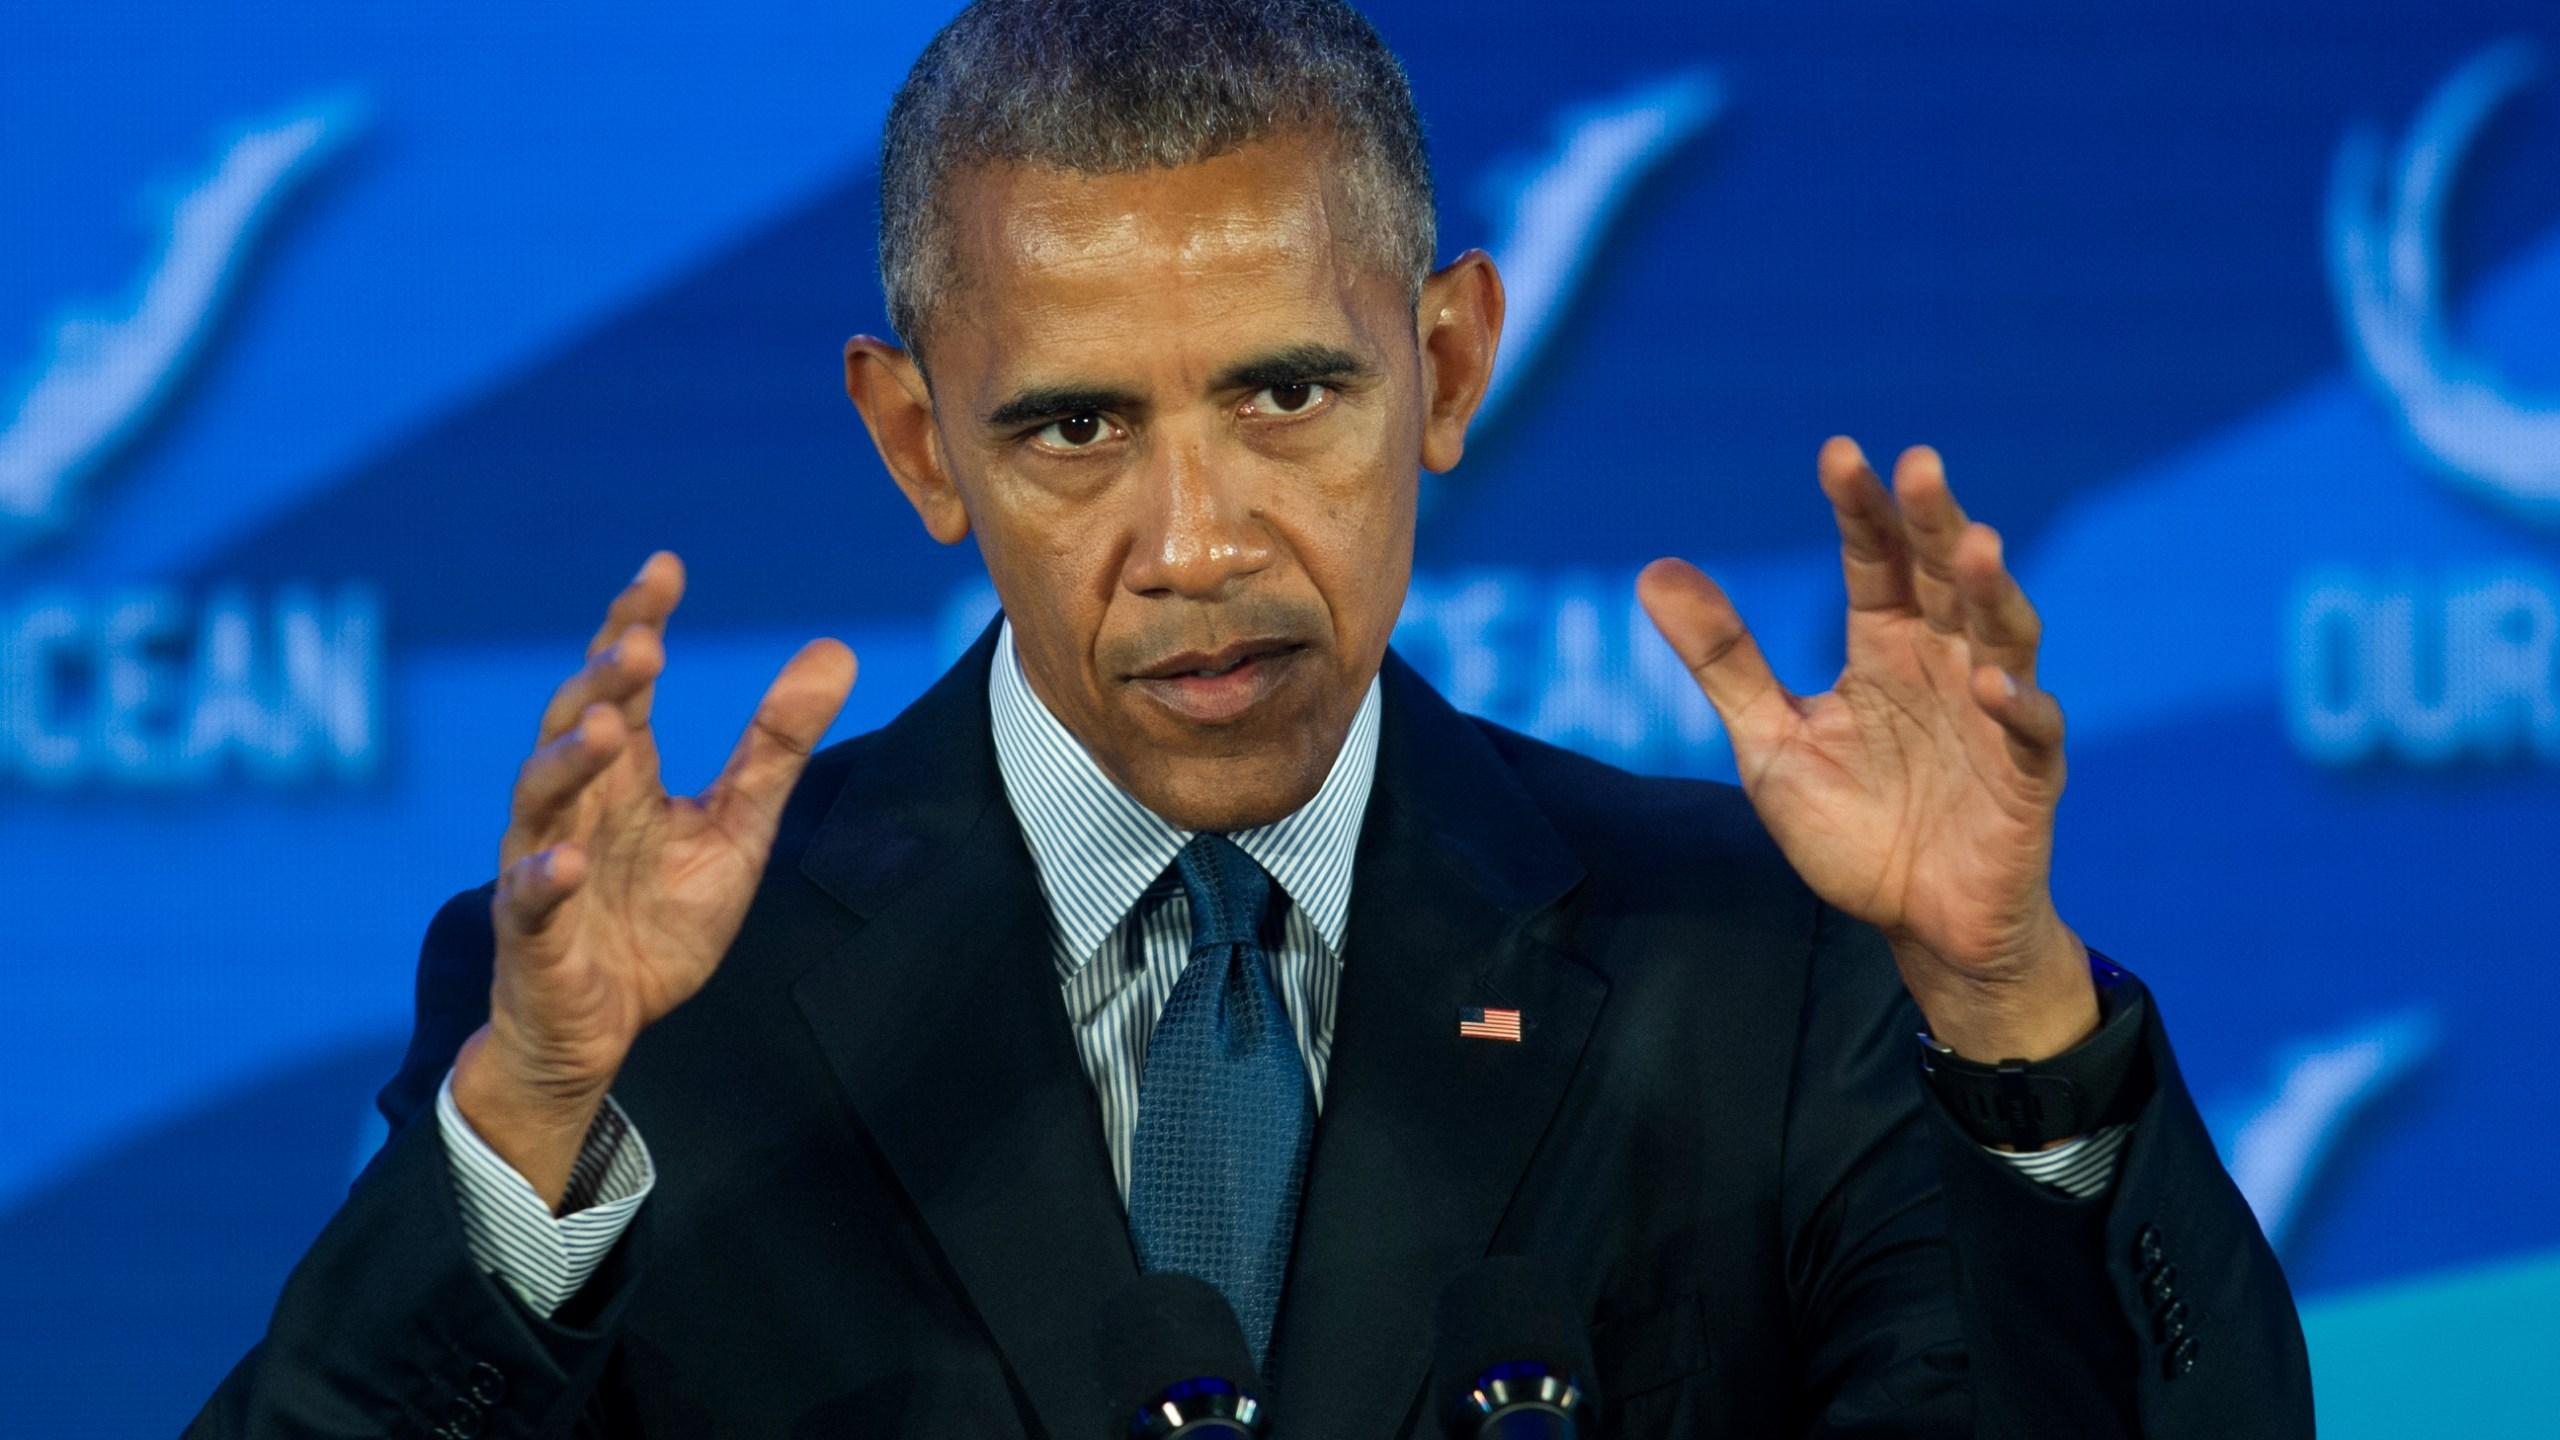 Obama Our Ocean 2016_467068